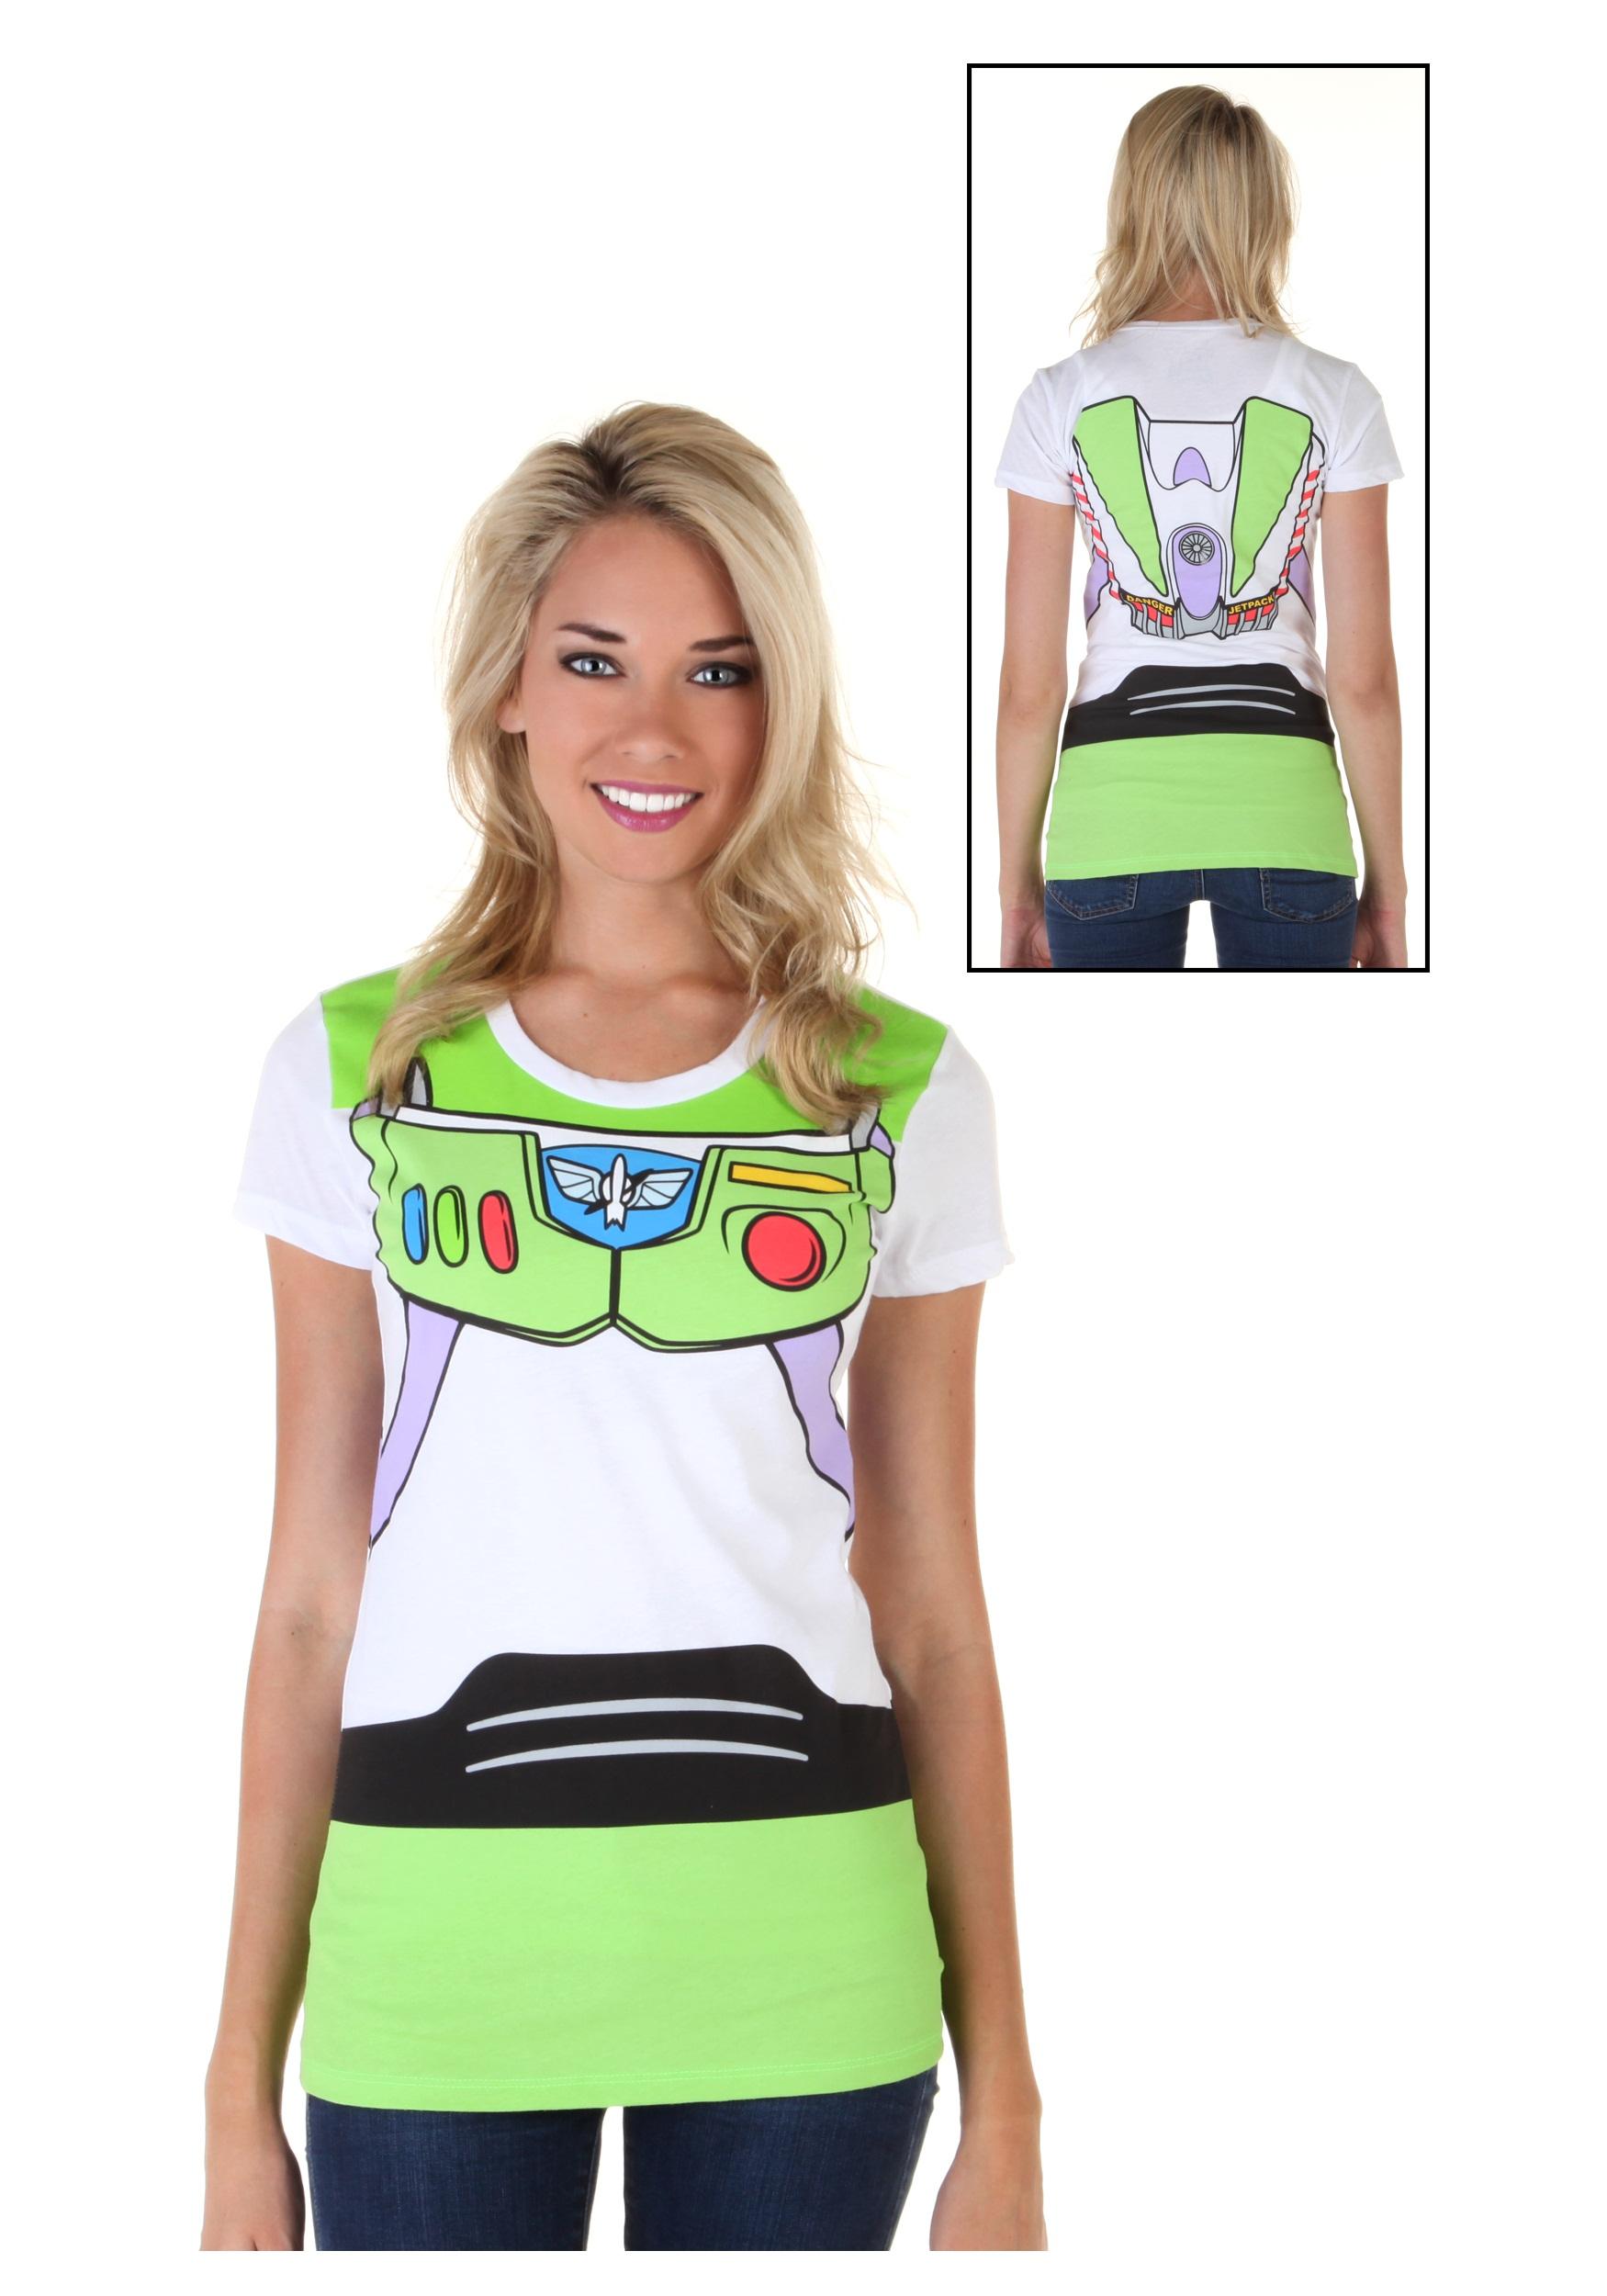 Toy Story Buzz Lightyear Women's T-Shirt Costume